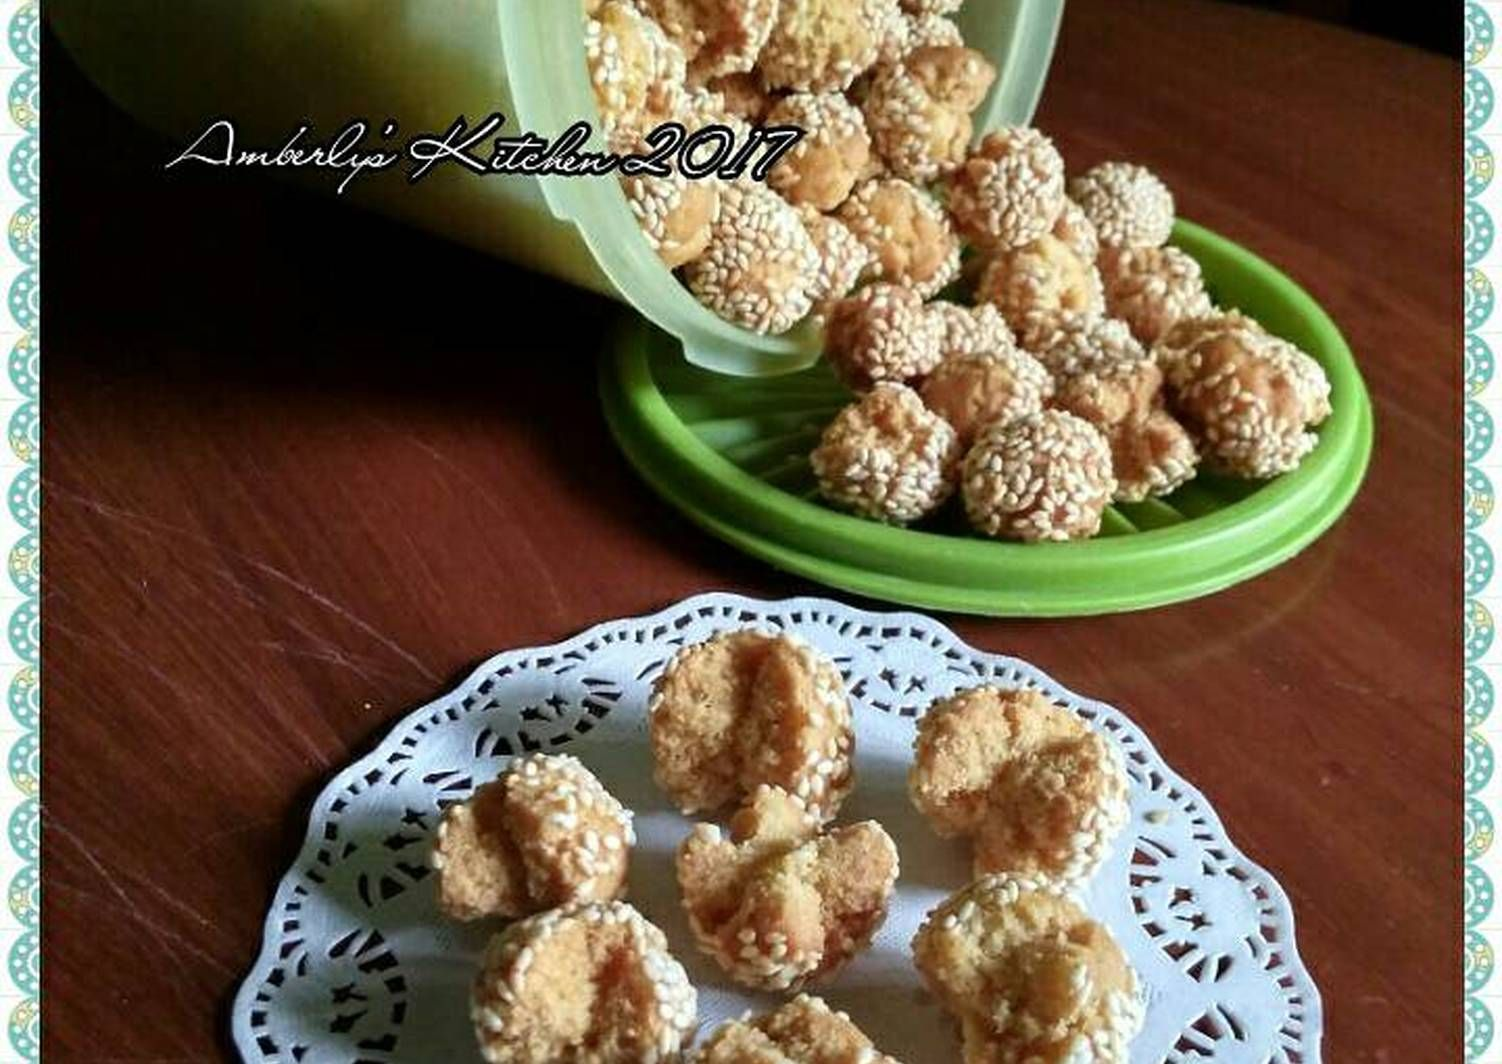 Resep Mini Onde Ketawa Oleh Amberly S Kitchen Resep Makanan Dan Minuman Makanan Anjing Makanan Penutup